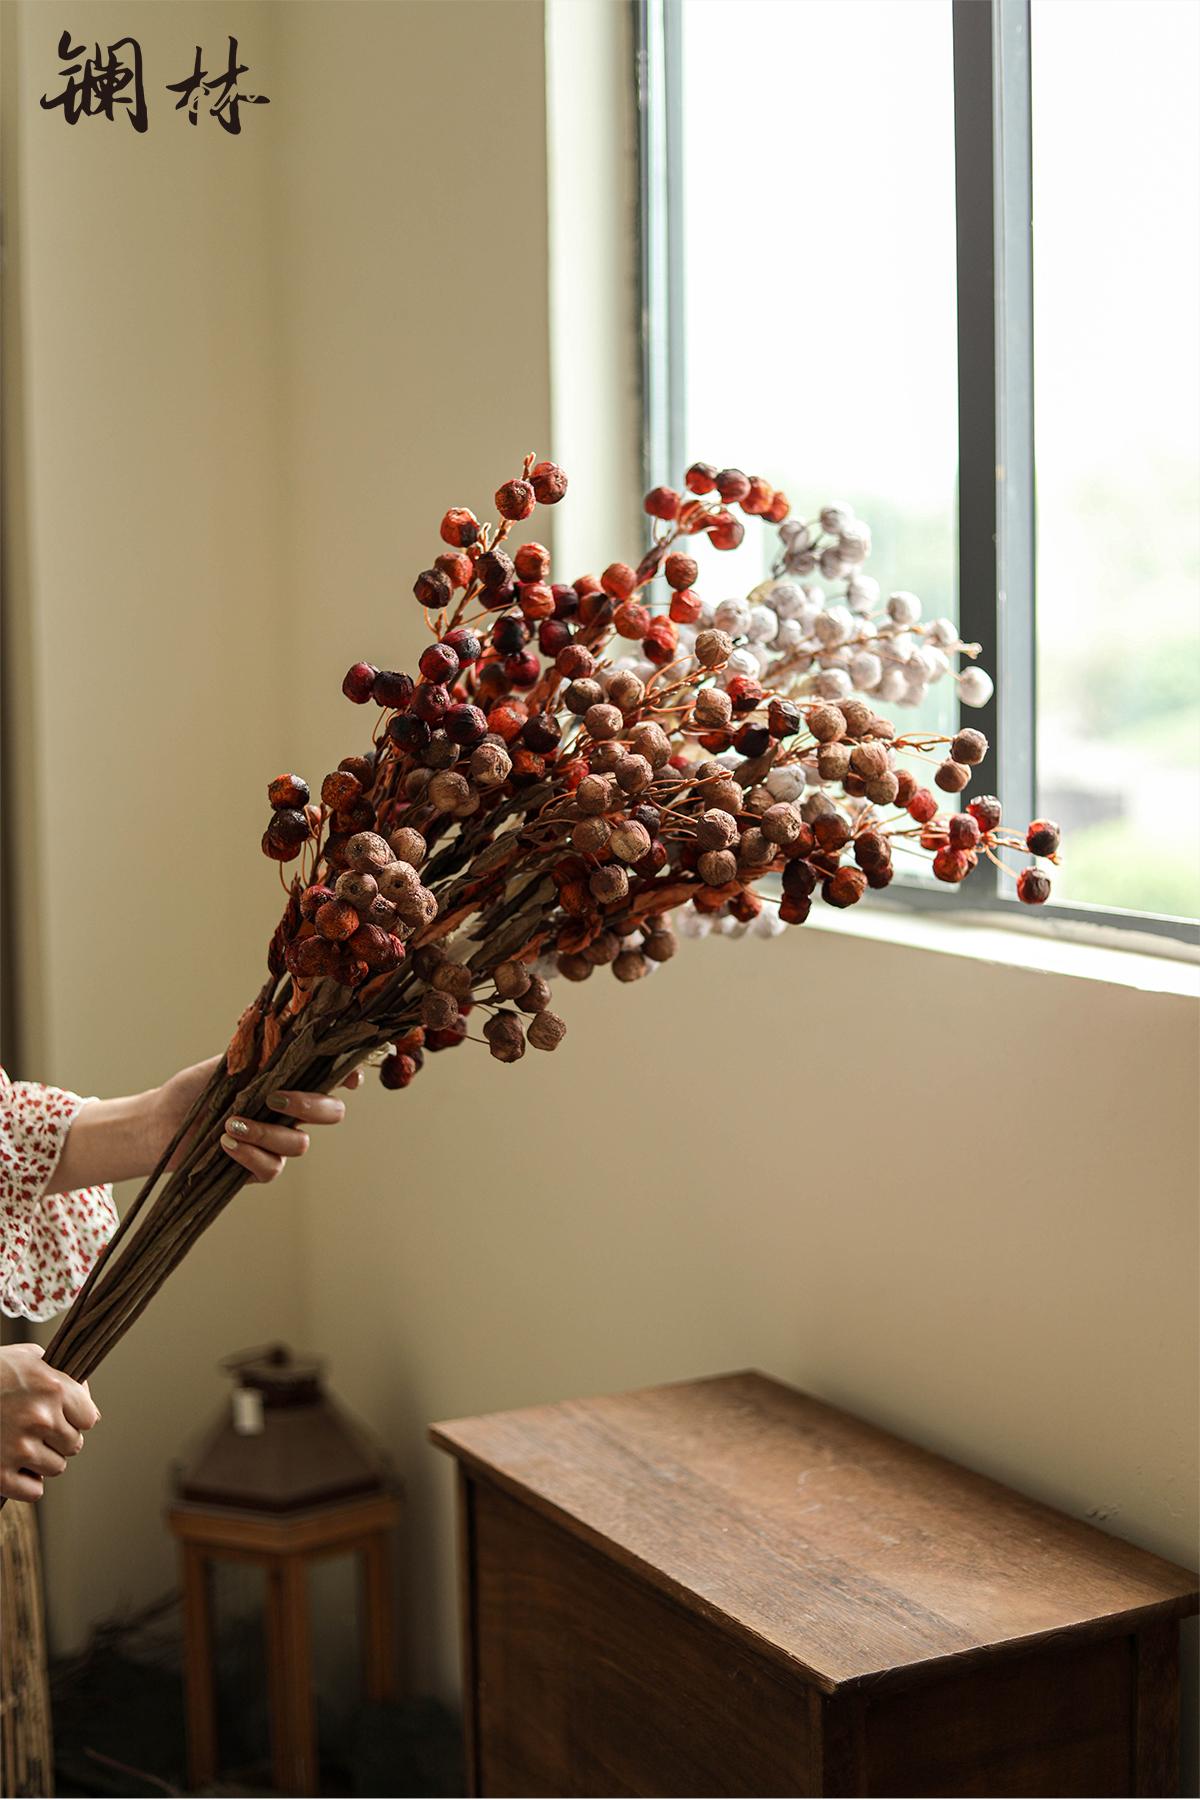 Autumn simulation flower big fruit coarse pottery furnishing articles do old wabi-sabi wind restoring ancient ways furnishing articles home stay soft outfit hotel decoration